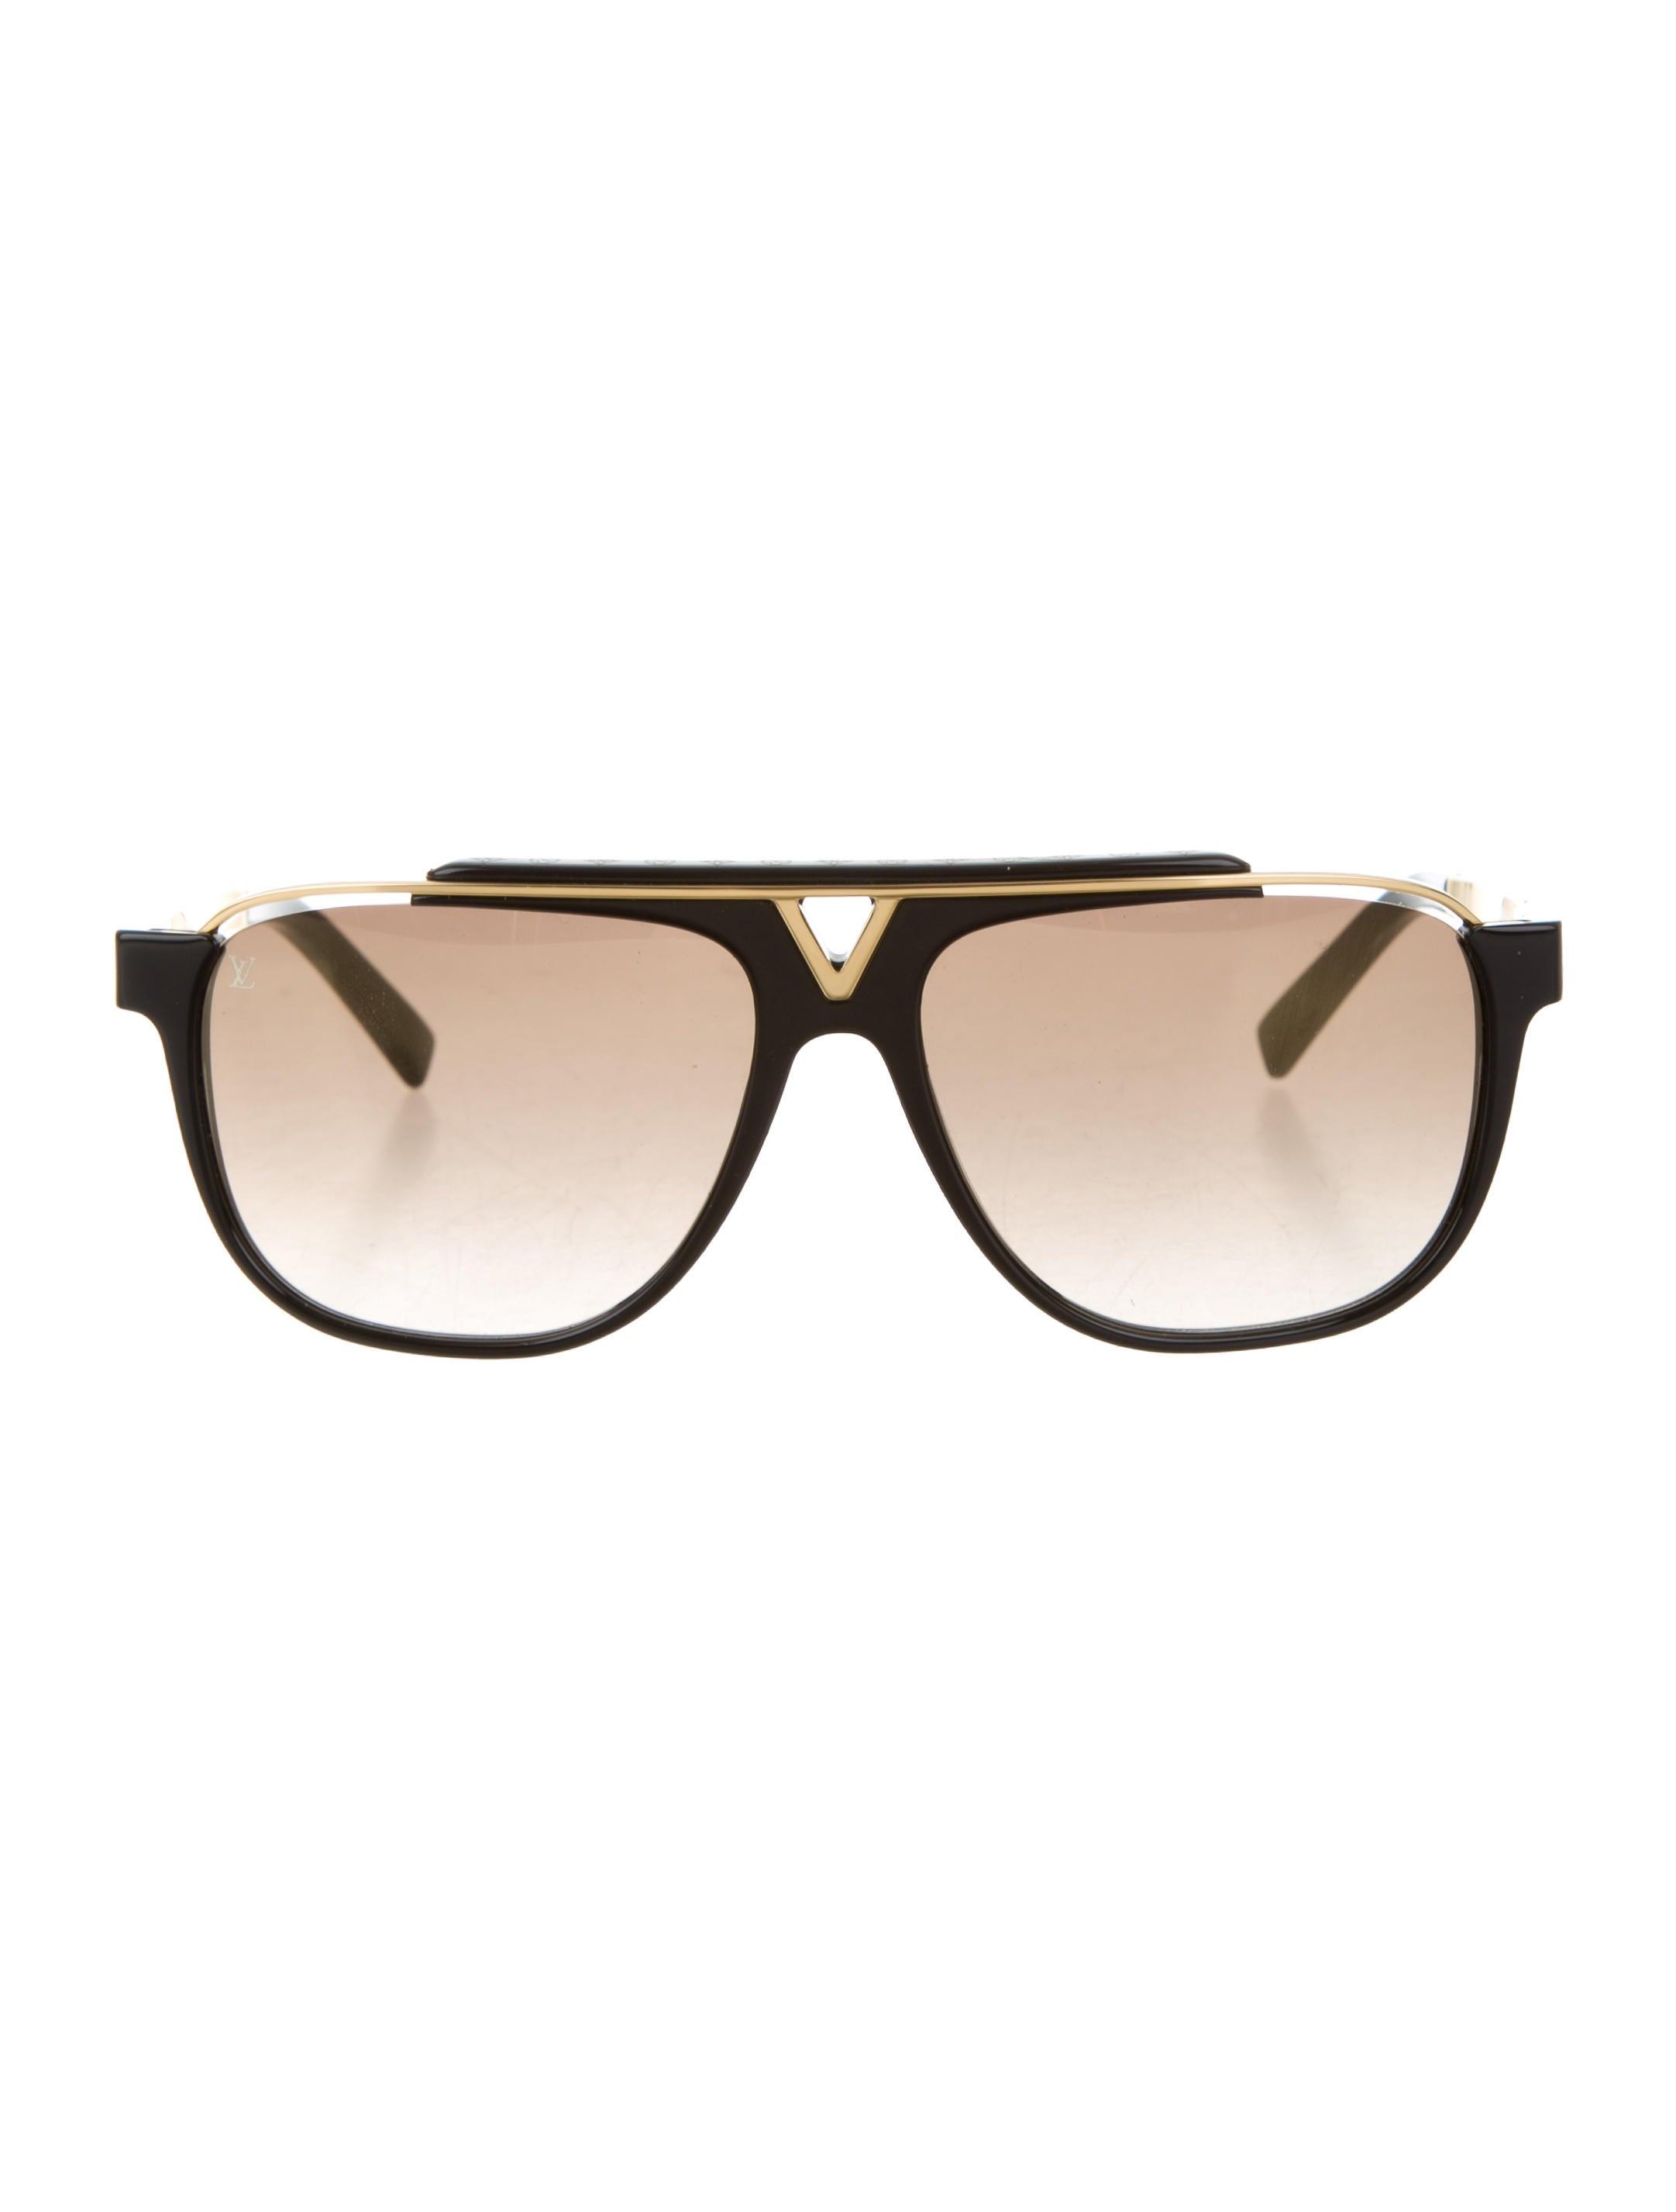 6aabbac4ad Louis Vuitton 2017 Mascot Sunglasses - Accessories - LOU133209